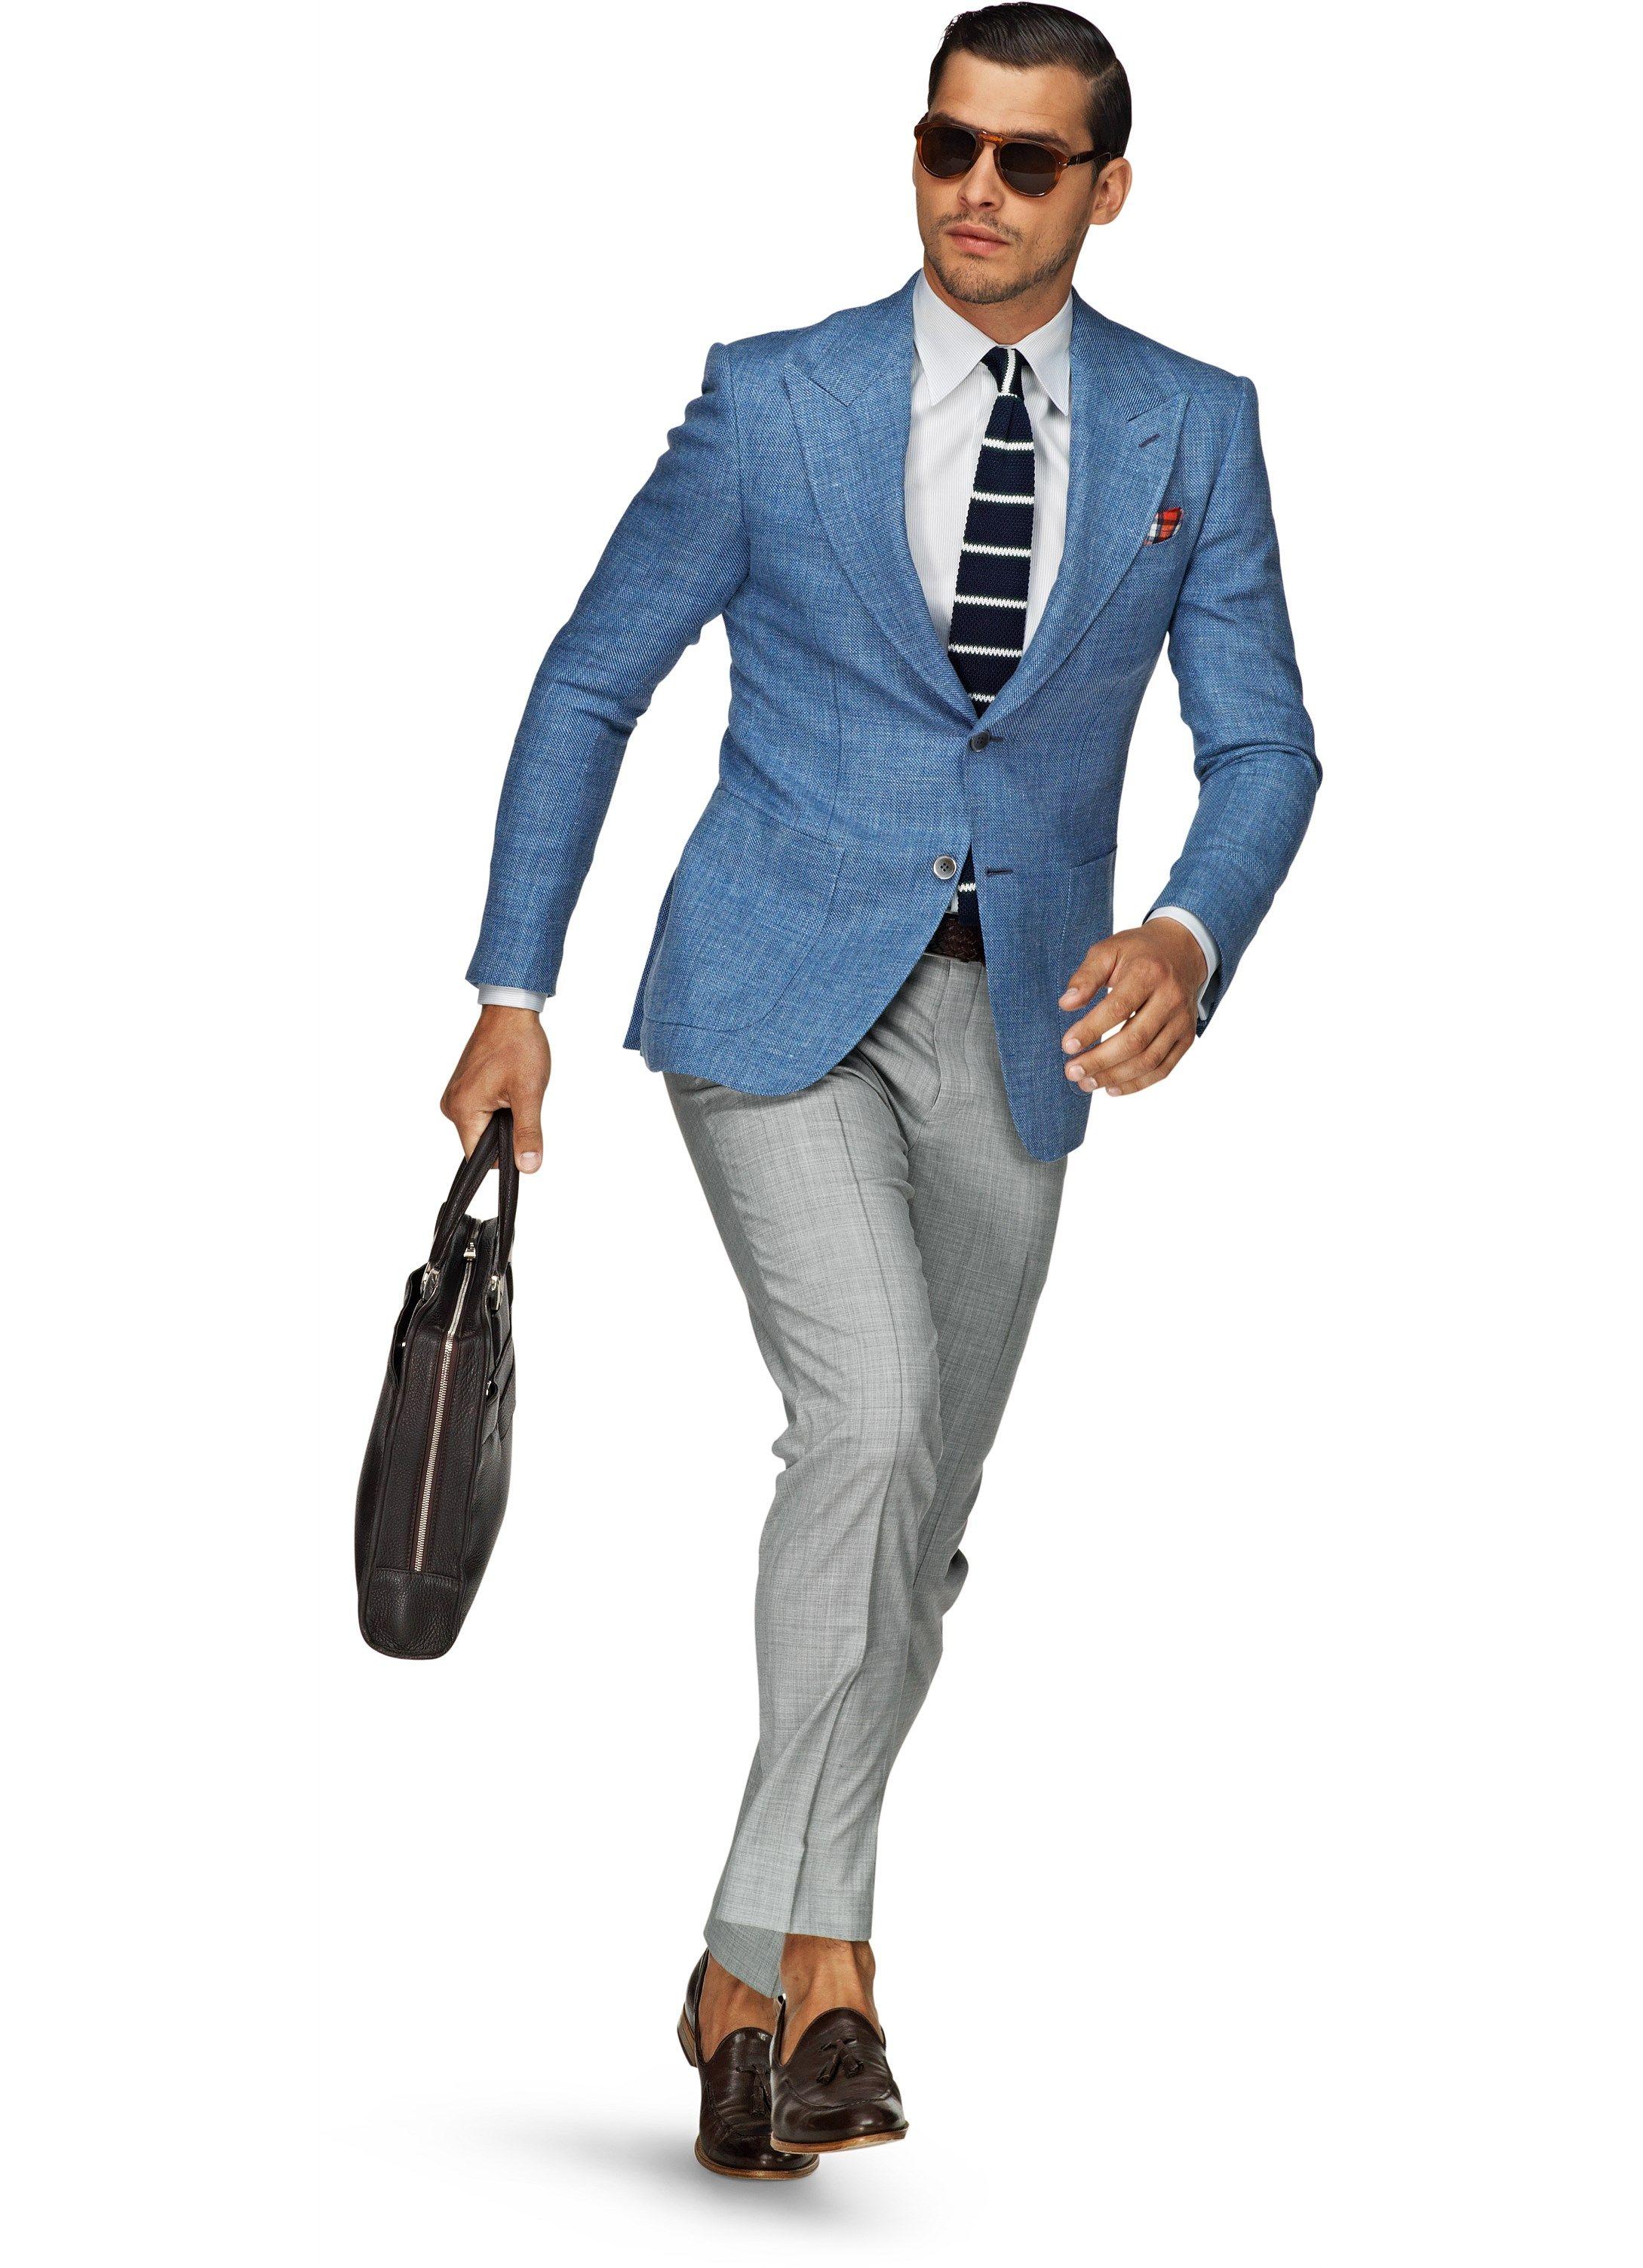 Suit Supply Washington Light Blue Plain 40R Things to